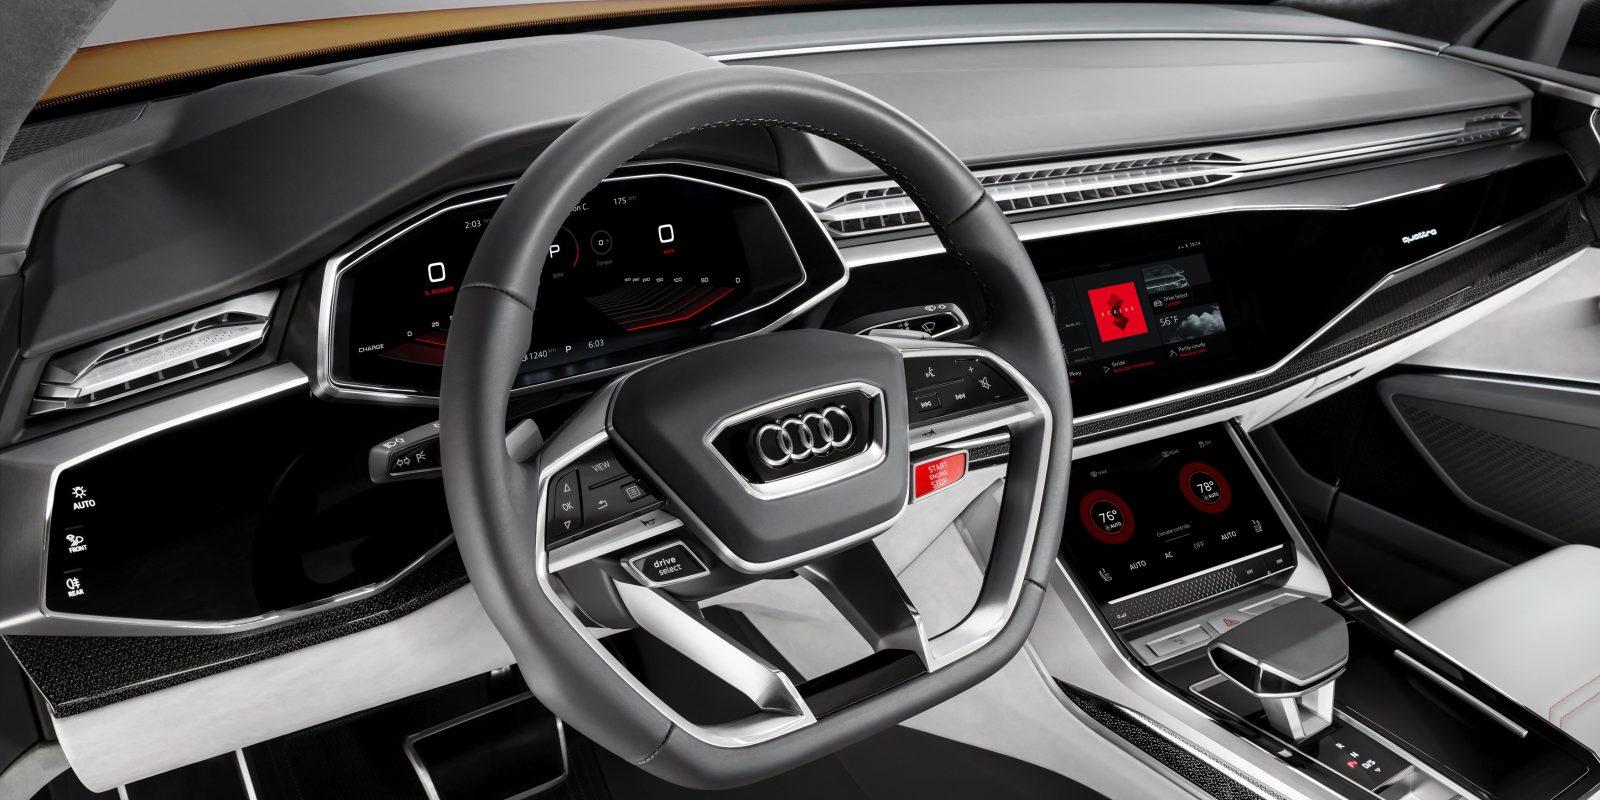 Android Cars At Google IO Audi And Volvo Bringing Android To - Google audi car